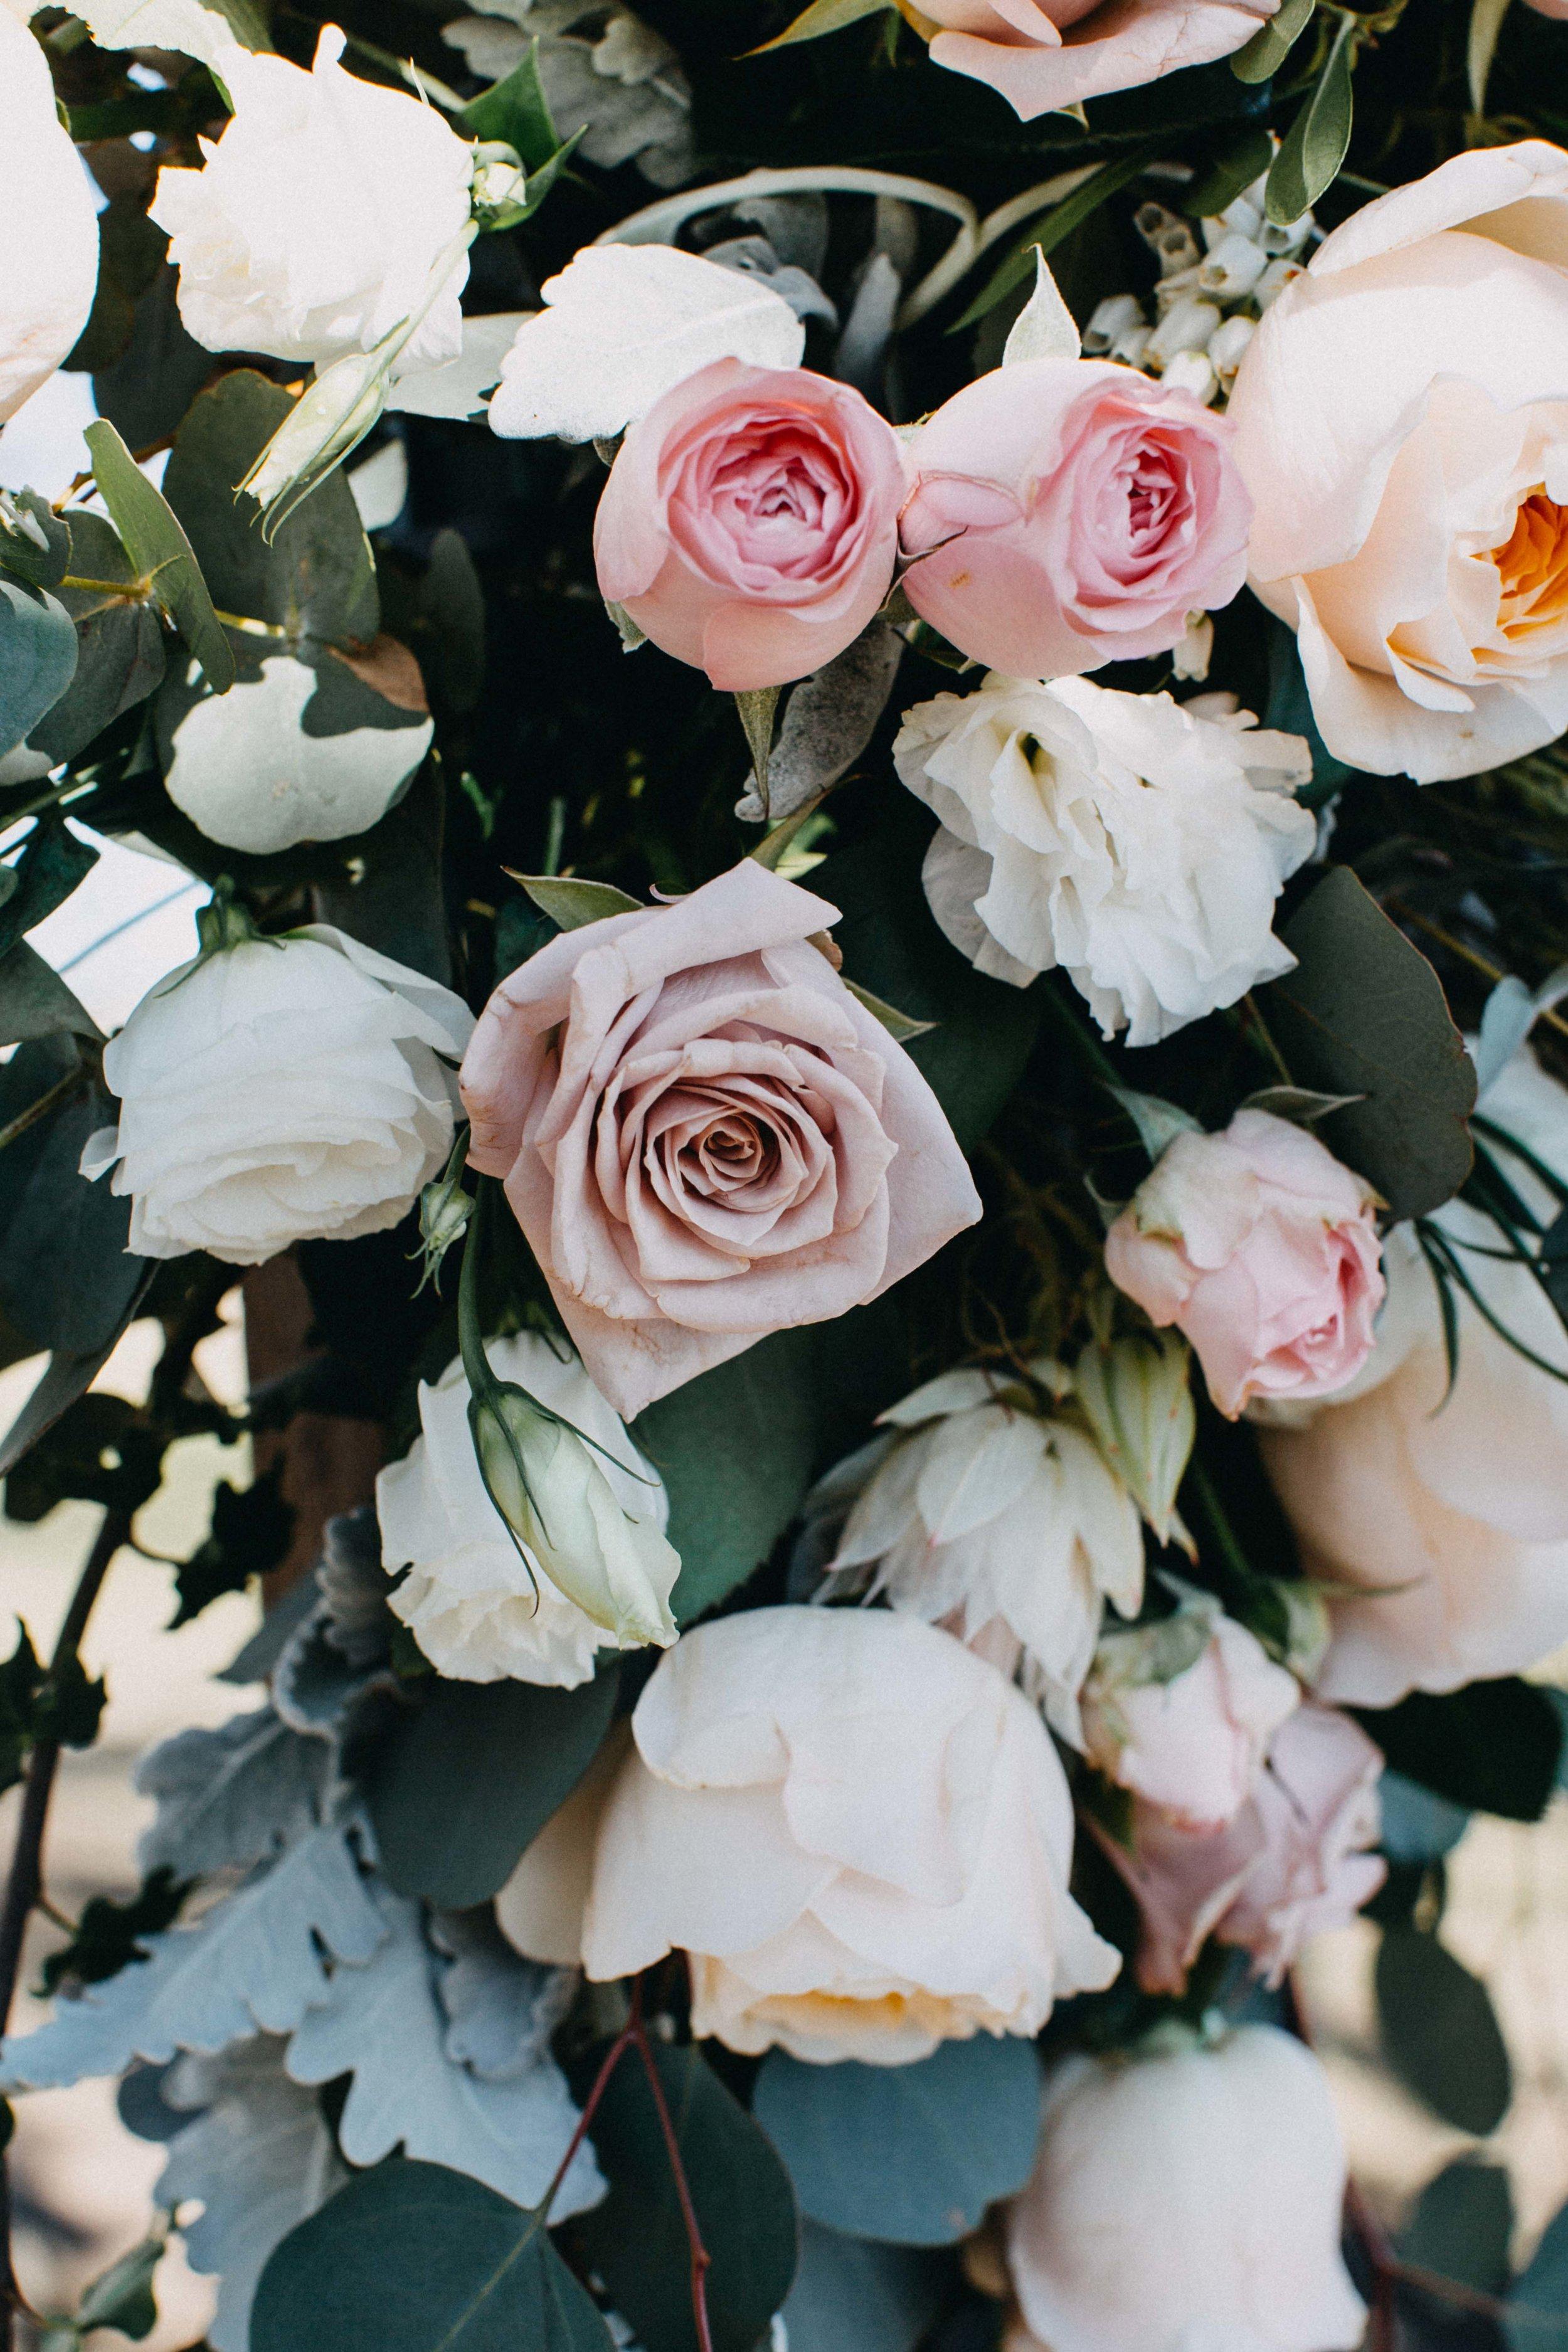 exeter-southern-highlands-wedding-www.emilyobrienphotography.net -55.jpg